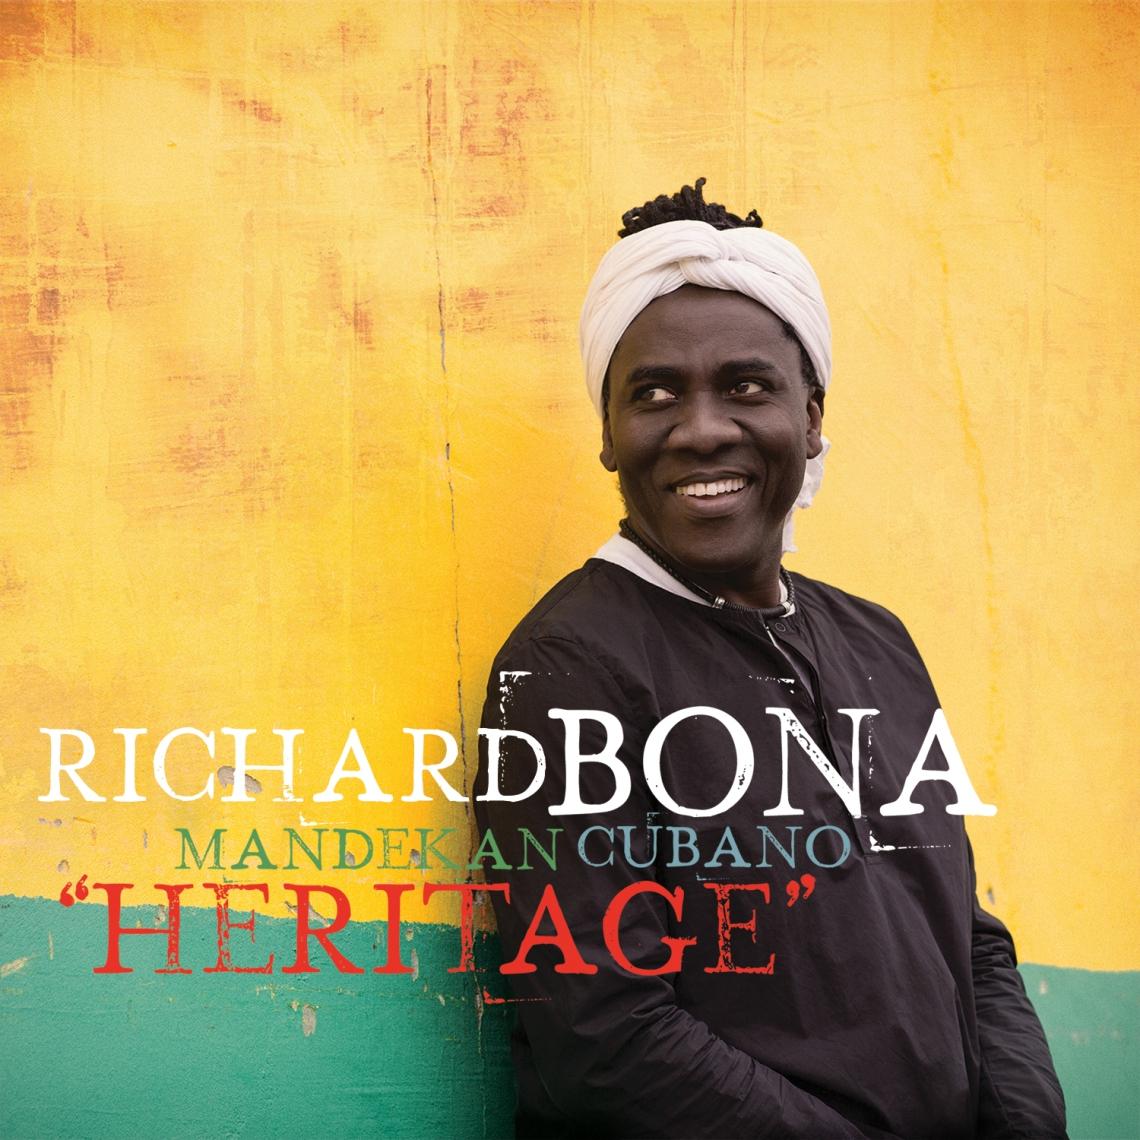 22906-Richard_20Bona_20-_20Heritage_20-_20Artwork